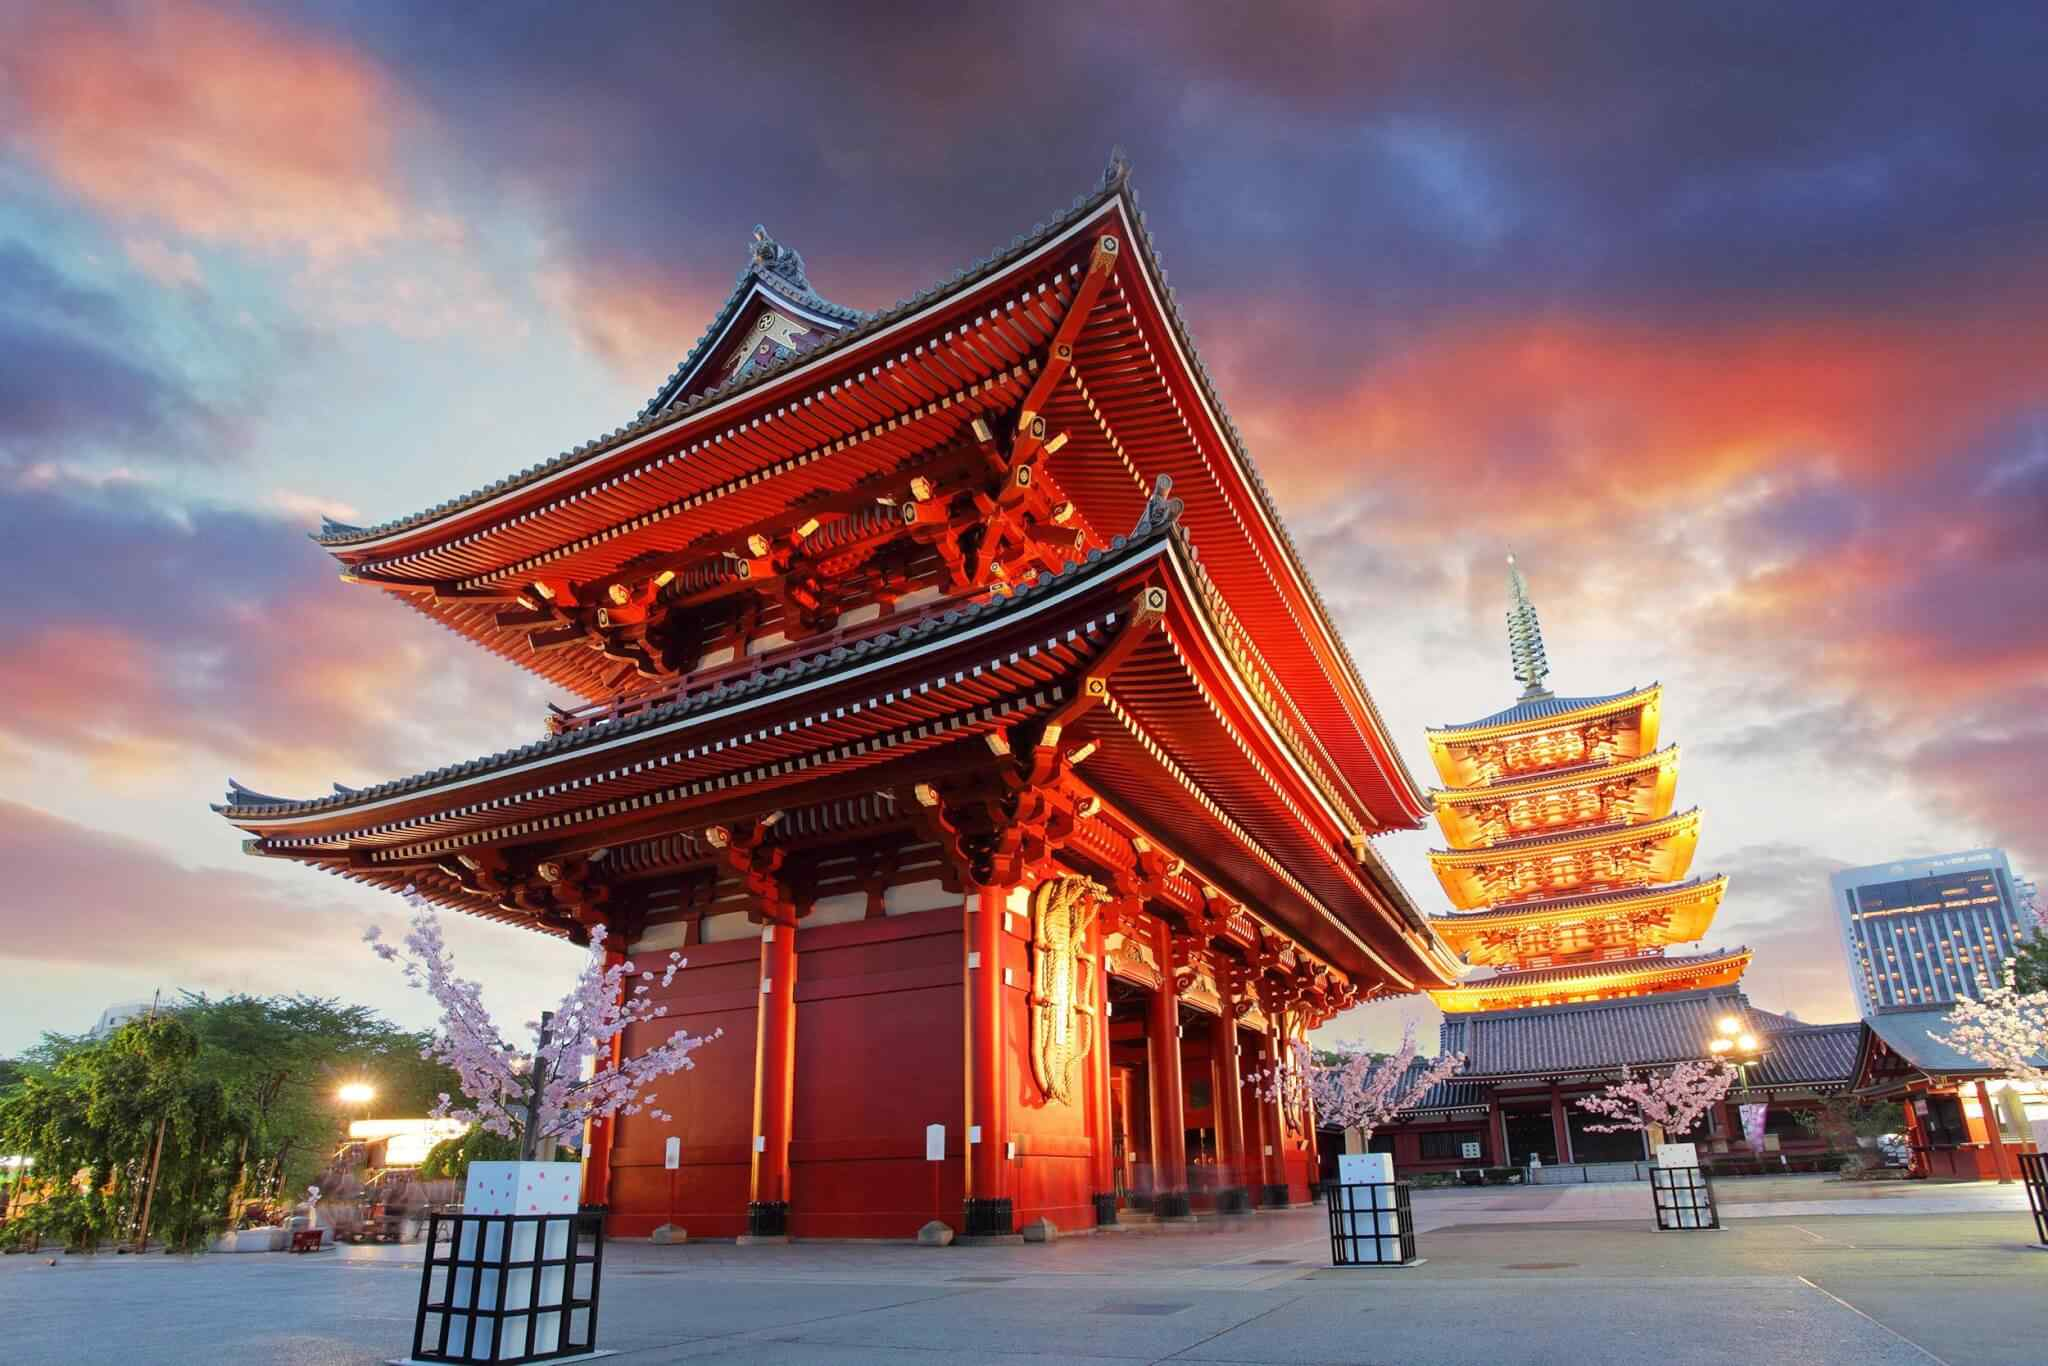 https://goiwv.com/wp-content/uploads/2018/09/destination-tokyo-01.jpg